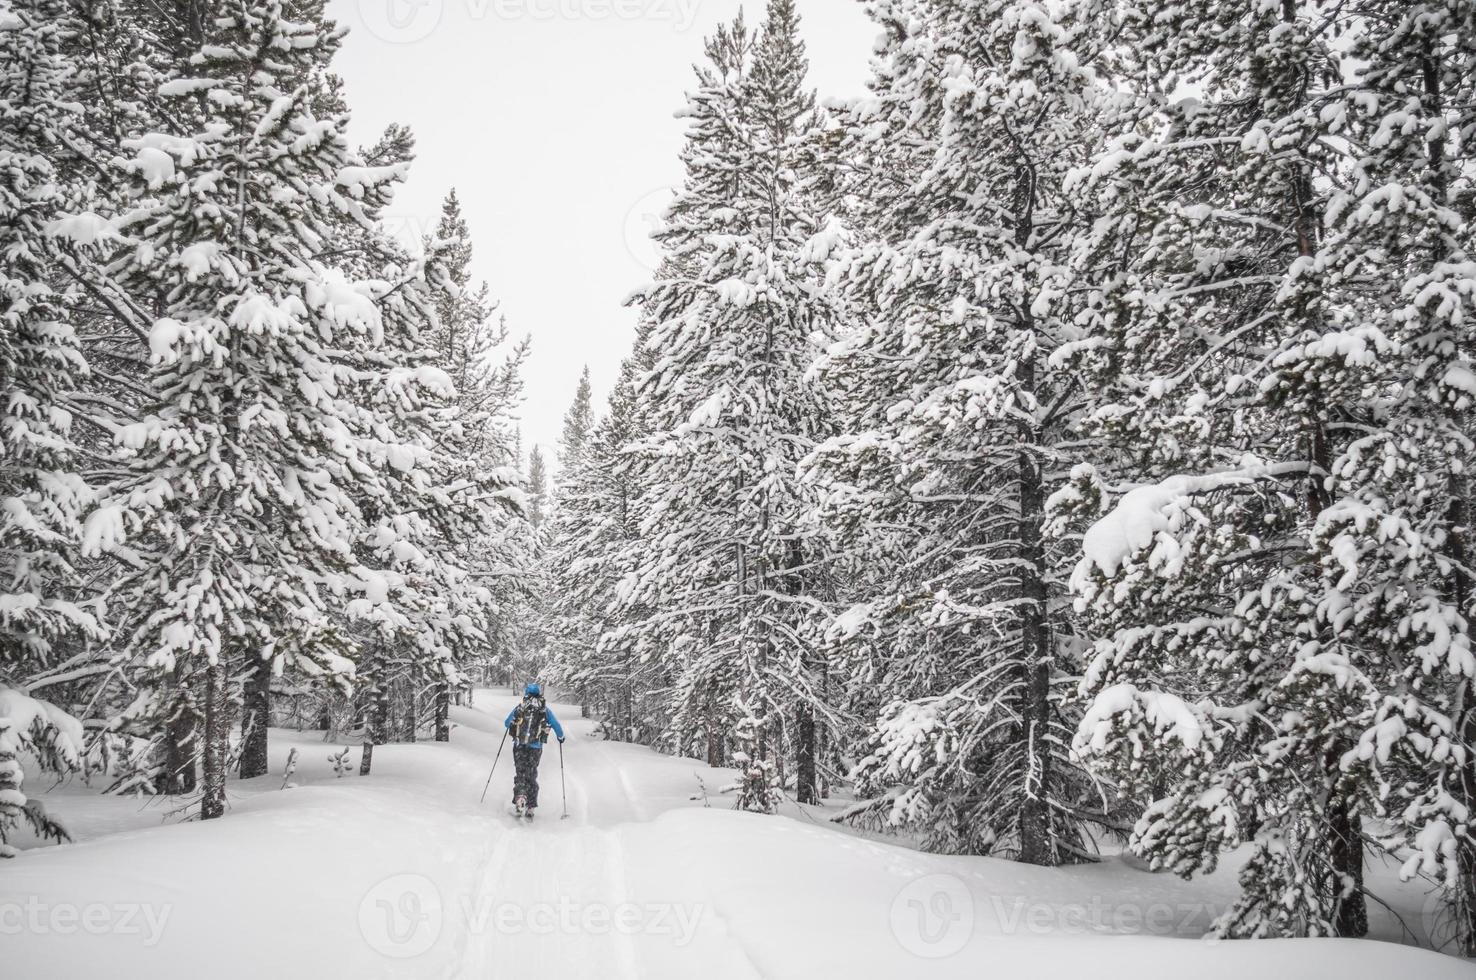 esquiar no inverno foto